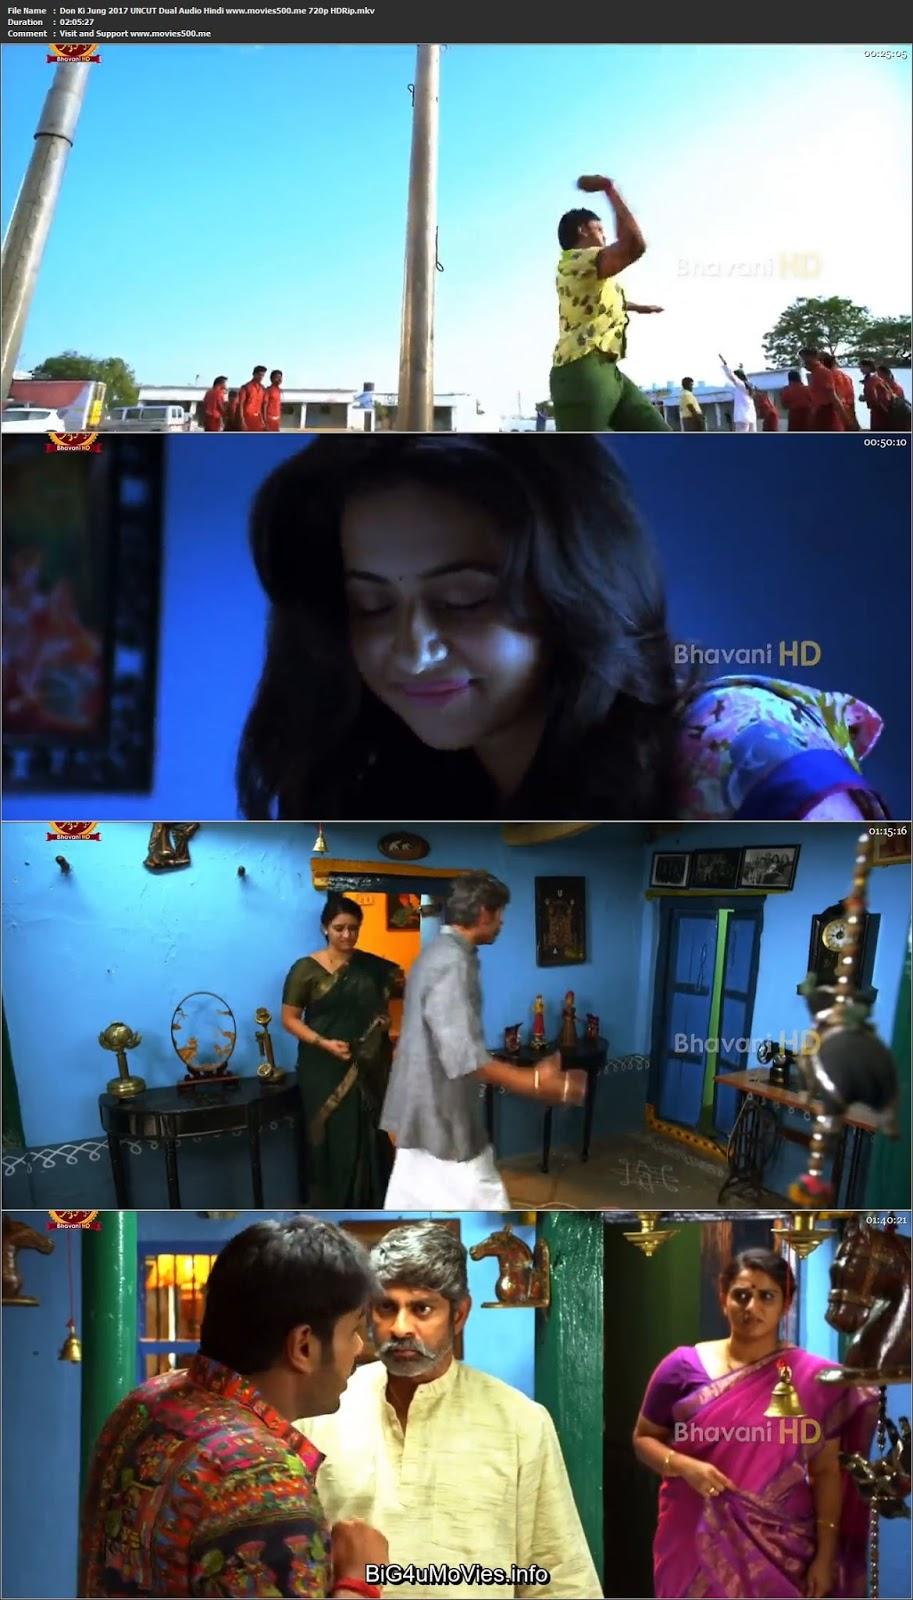 Don Ki Jung 2017 Dual Audio UnCUT Hindi Telugu HDRip 720p at movies500.site